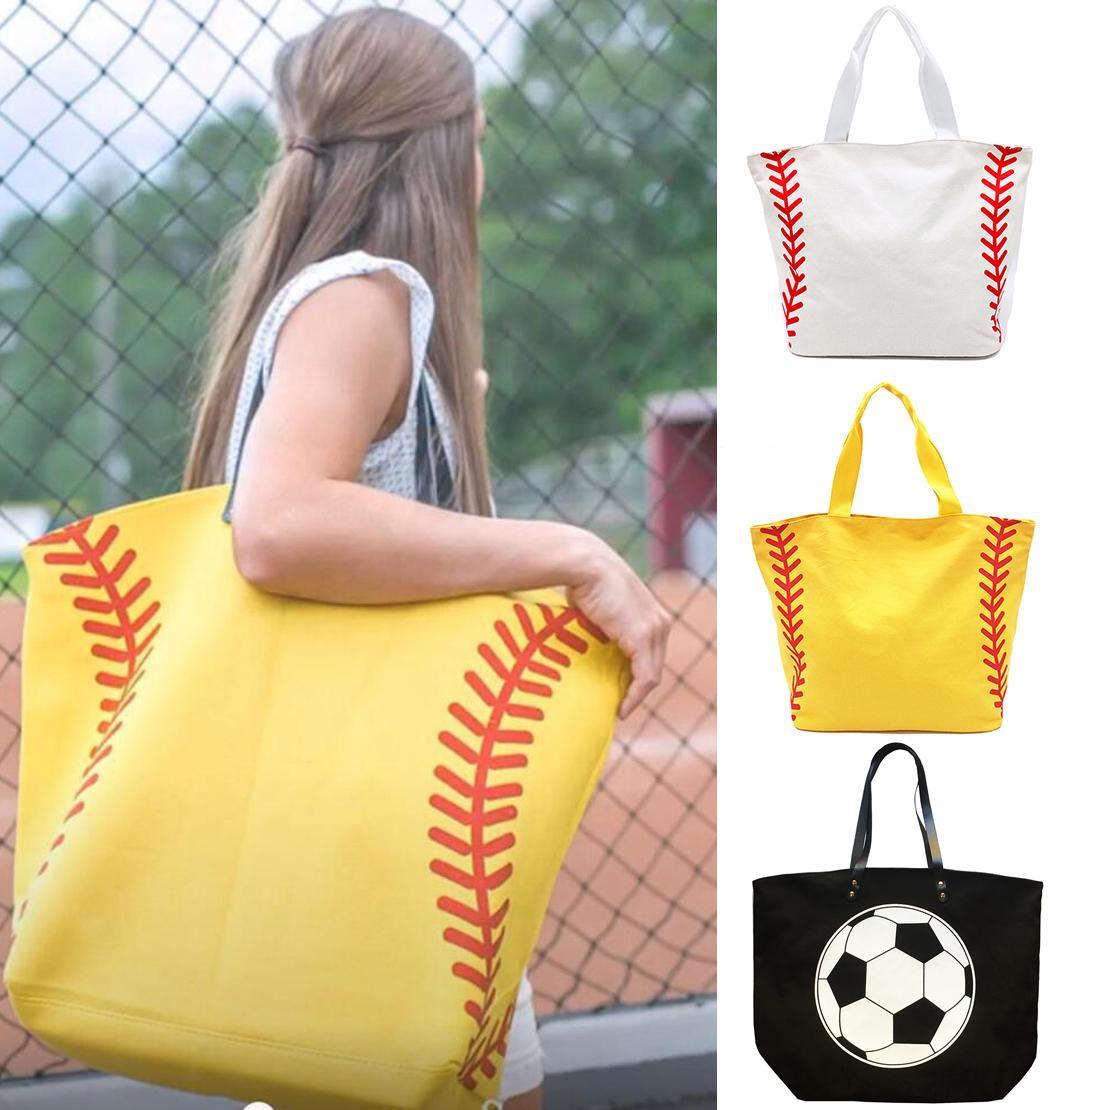 8 Colors Foldable Shopping Bag Printed Portable Handbags Baseball Tote Softball Basketball Football Volleyball Canvas Bags